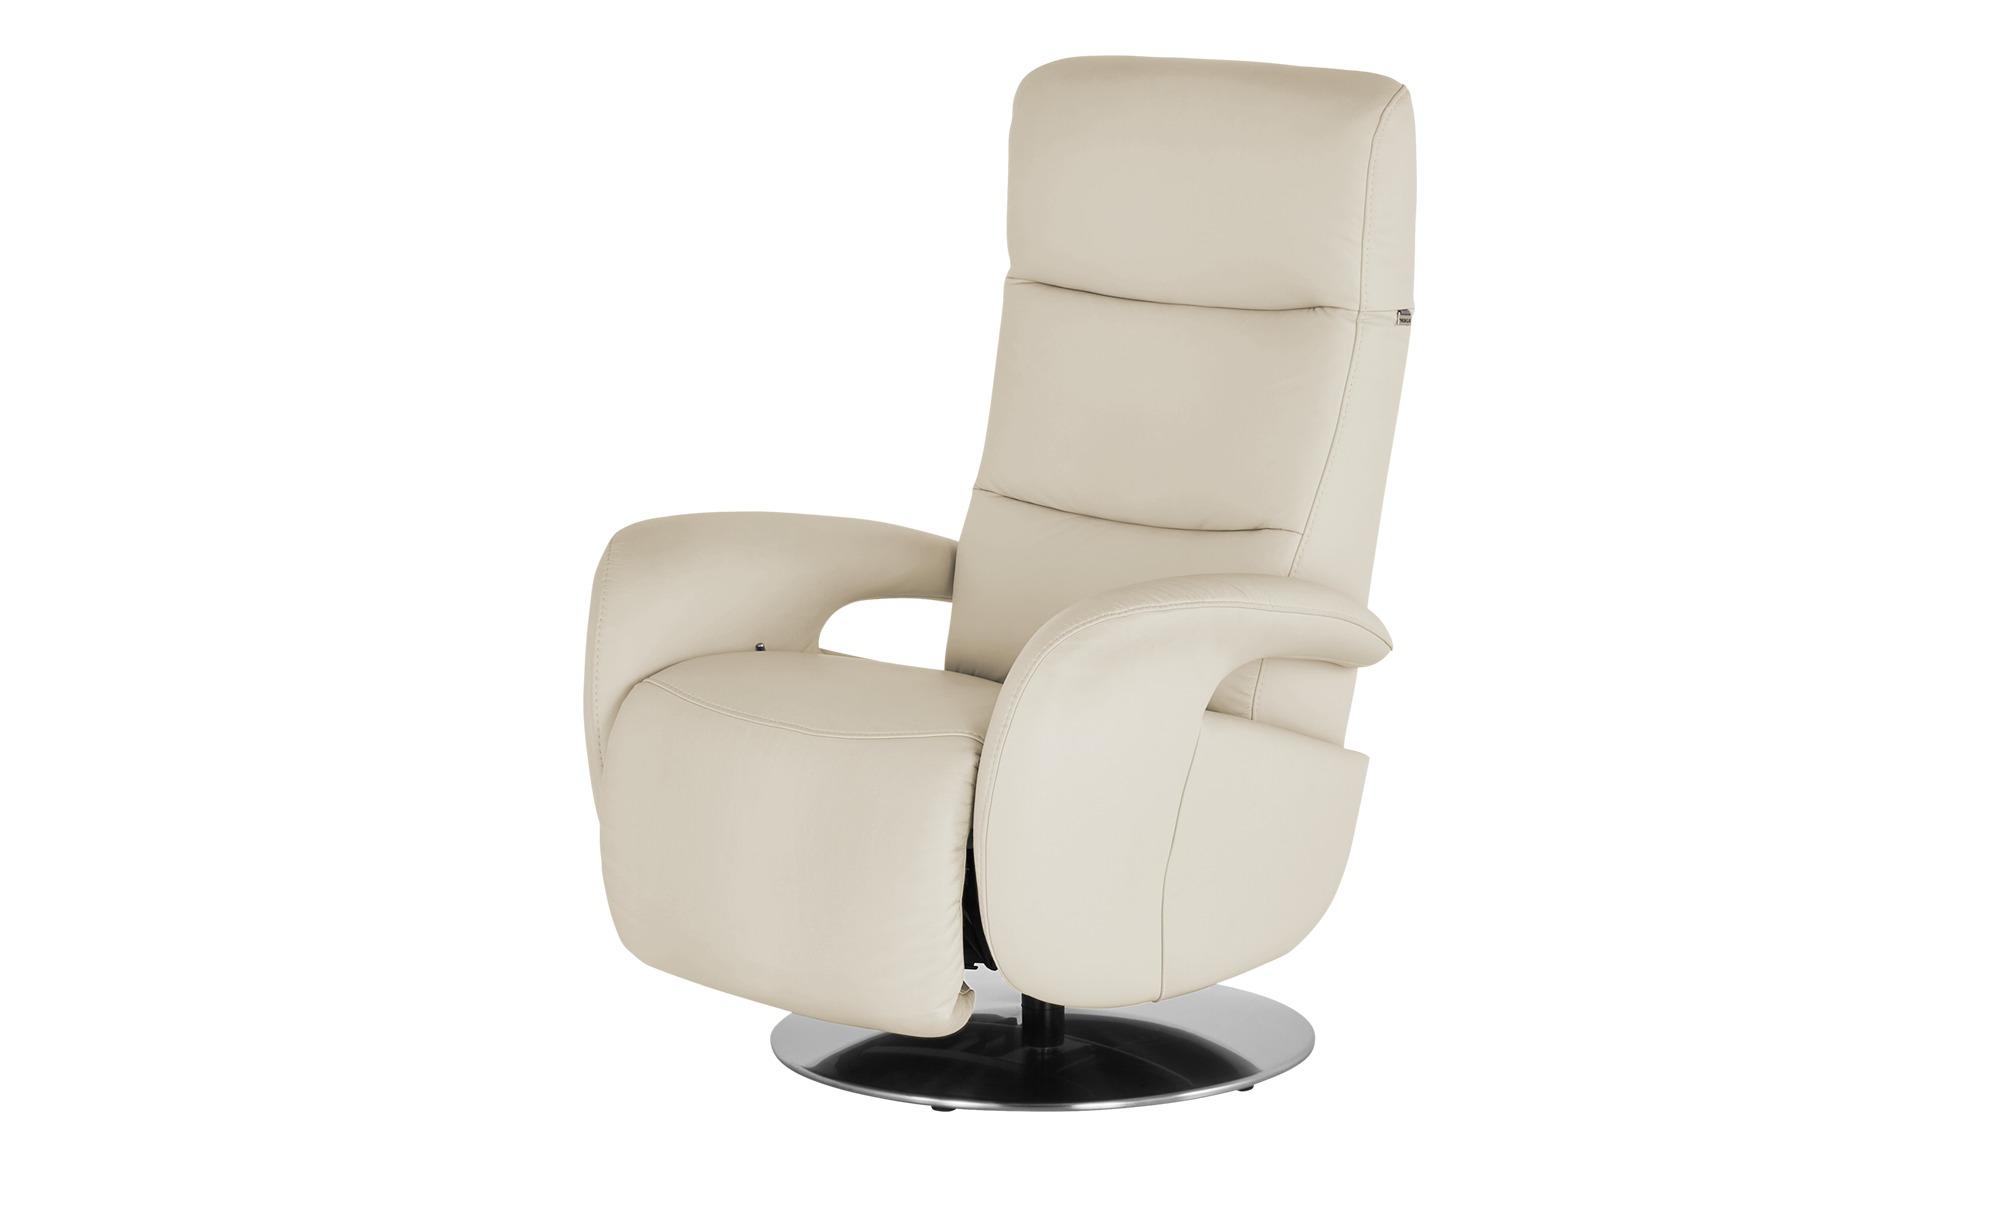 Hukla Relaxsessel  Andy ¦ creme ¦ Maße (cm): B: 79 H: 110 T: 85 Polstermöbel > Sessel > Fernsehsessel - Höffner